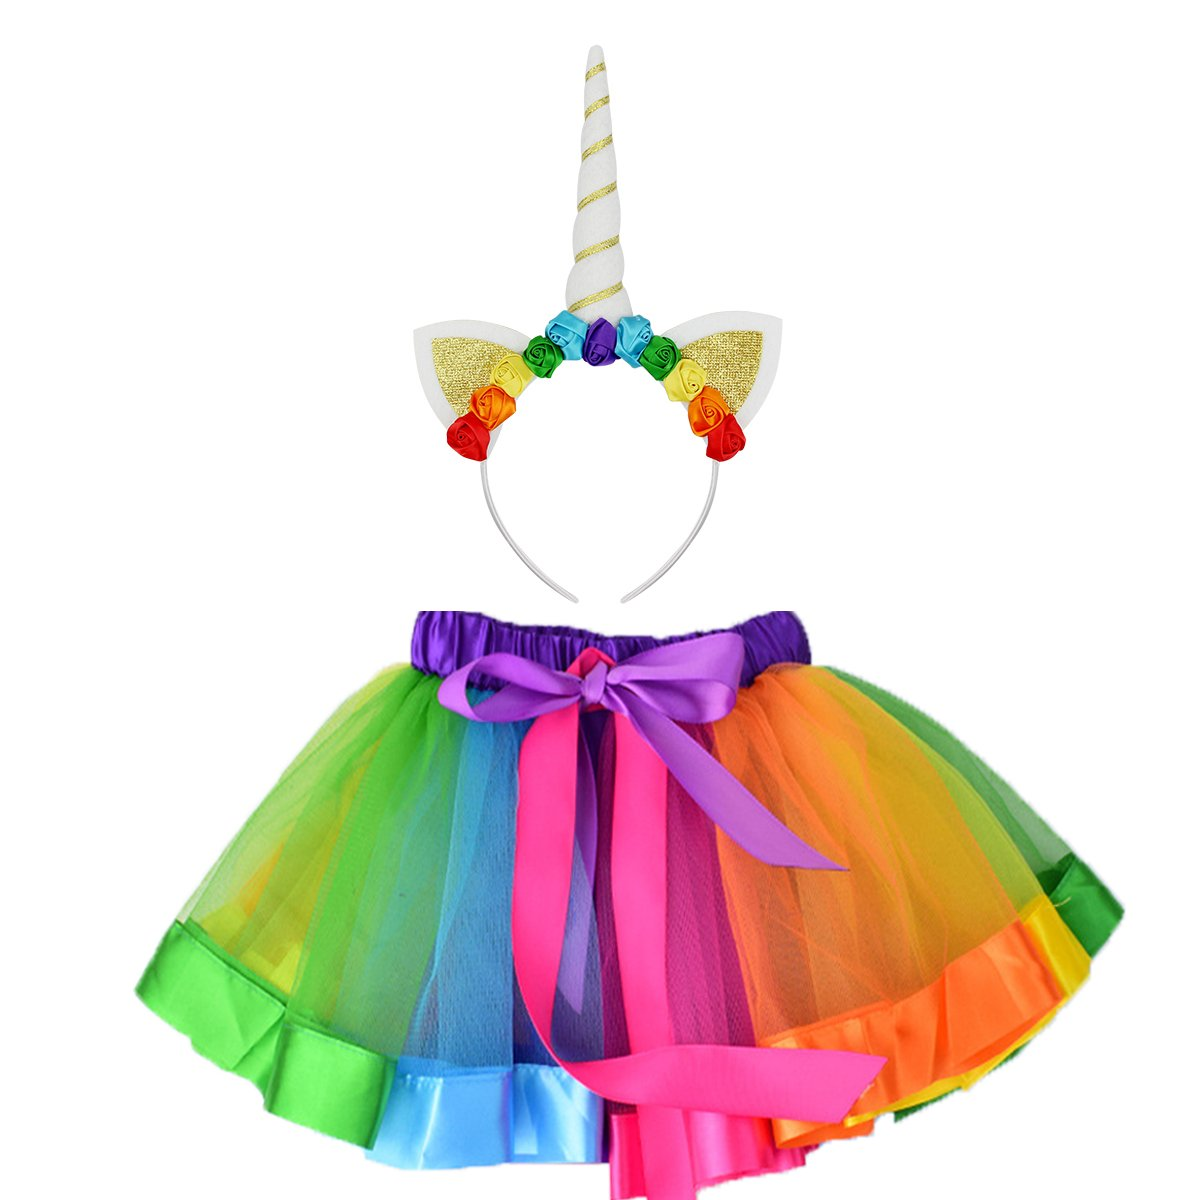 4603adfdef6c Sparkling Unicorn Tutu Skirt and Unicorn Headband Outfit for Girls 2T